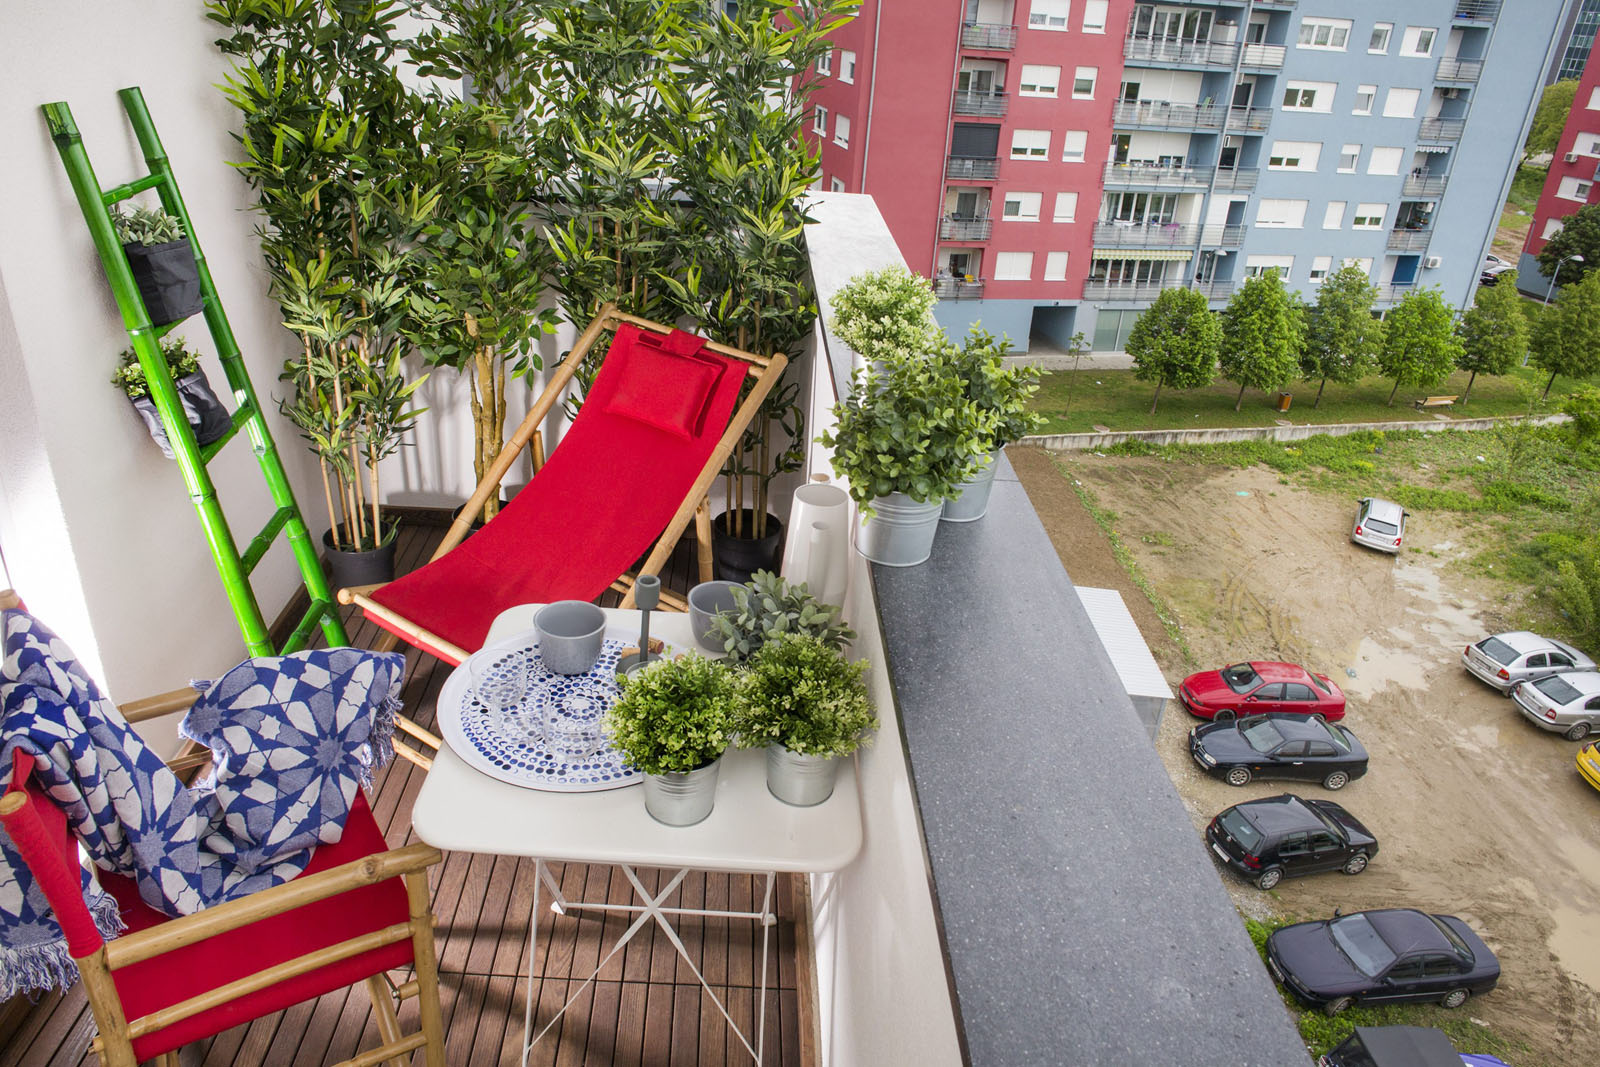 moj_prvi_stan_balkon7-09051